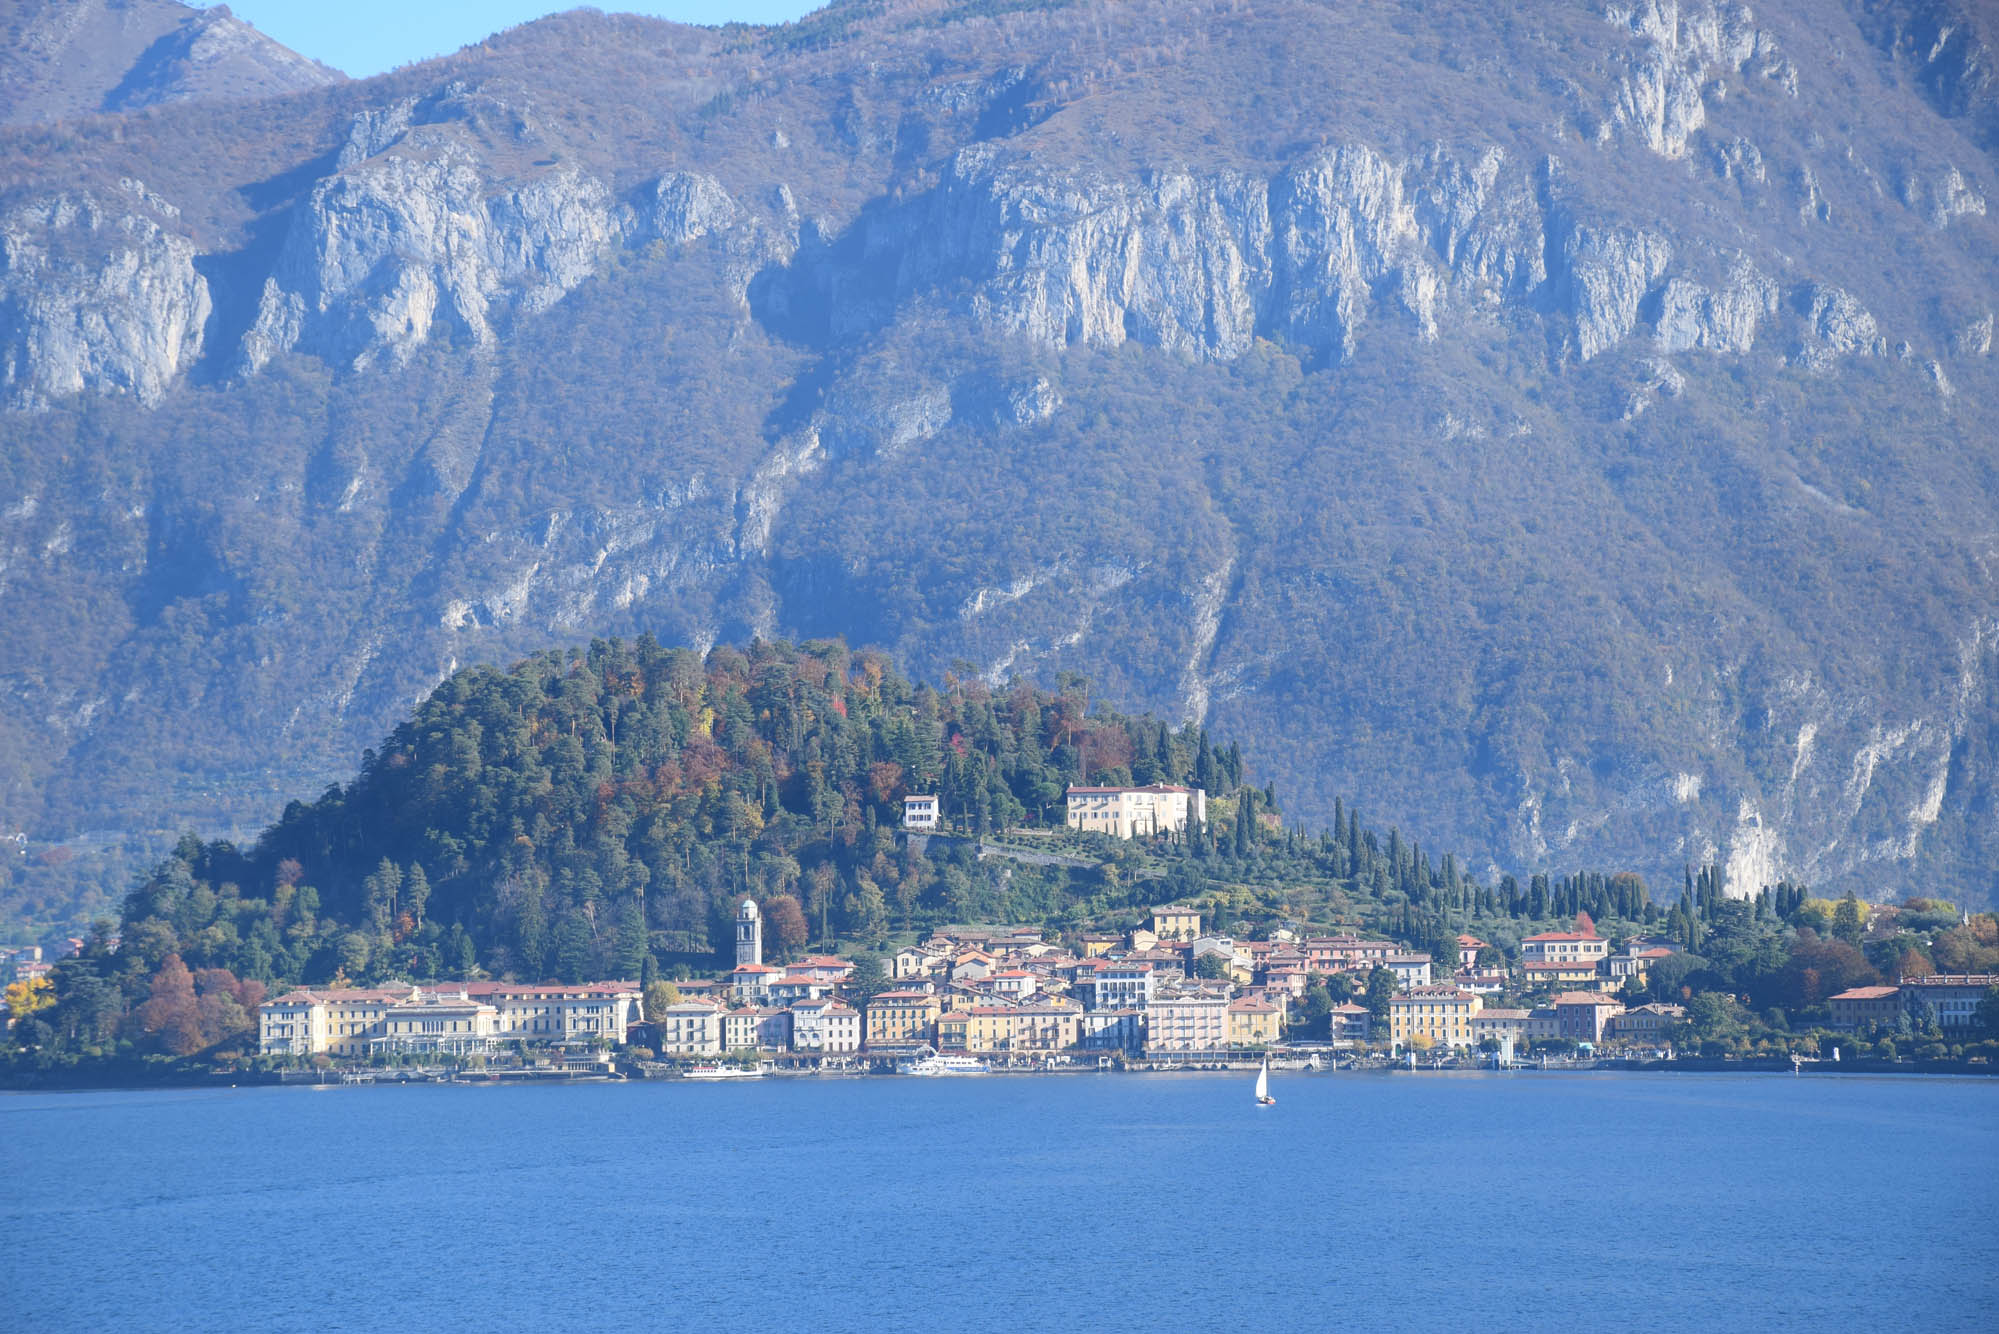 dicas lago di como itália - bellagio